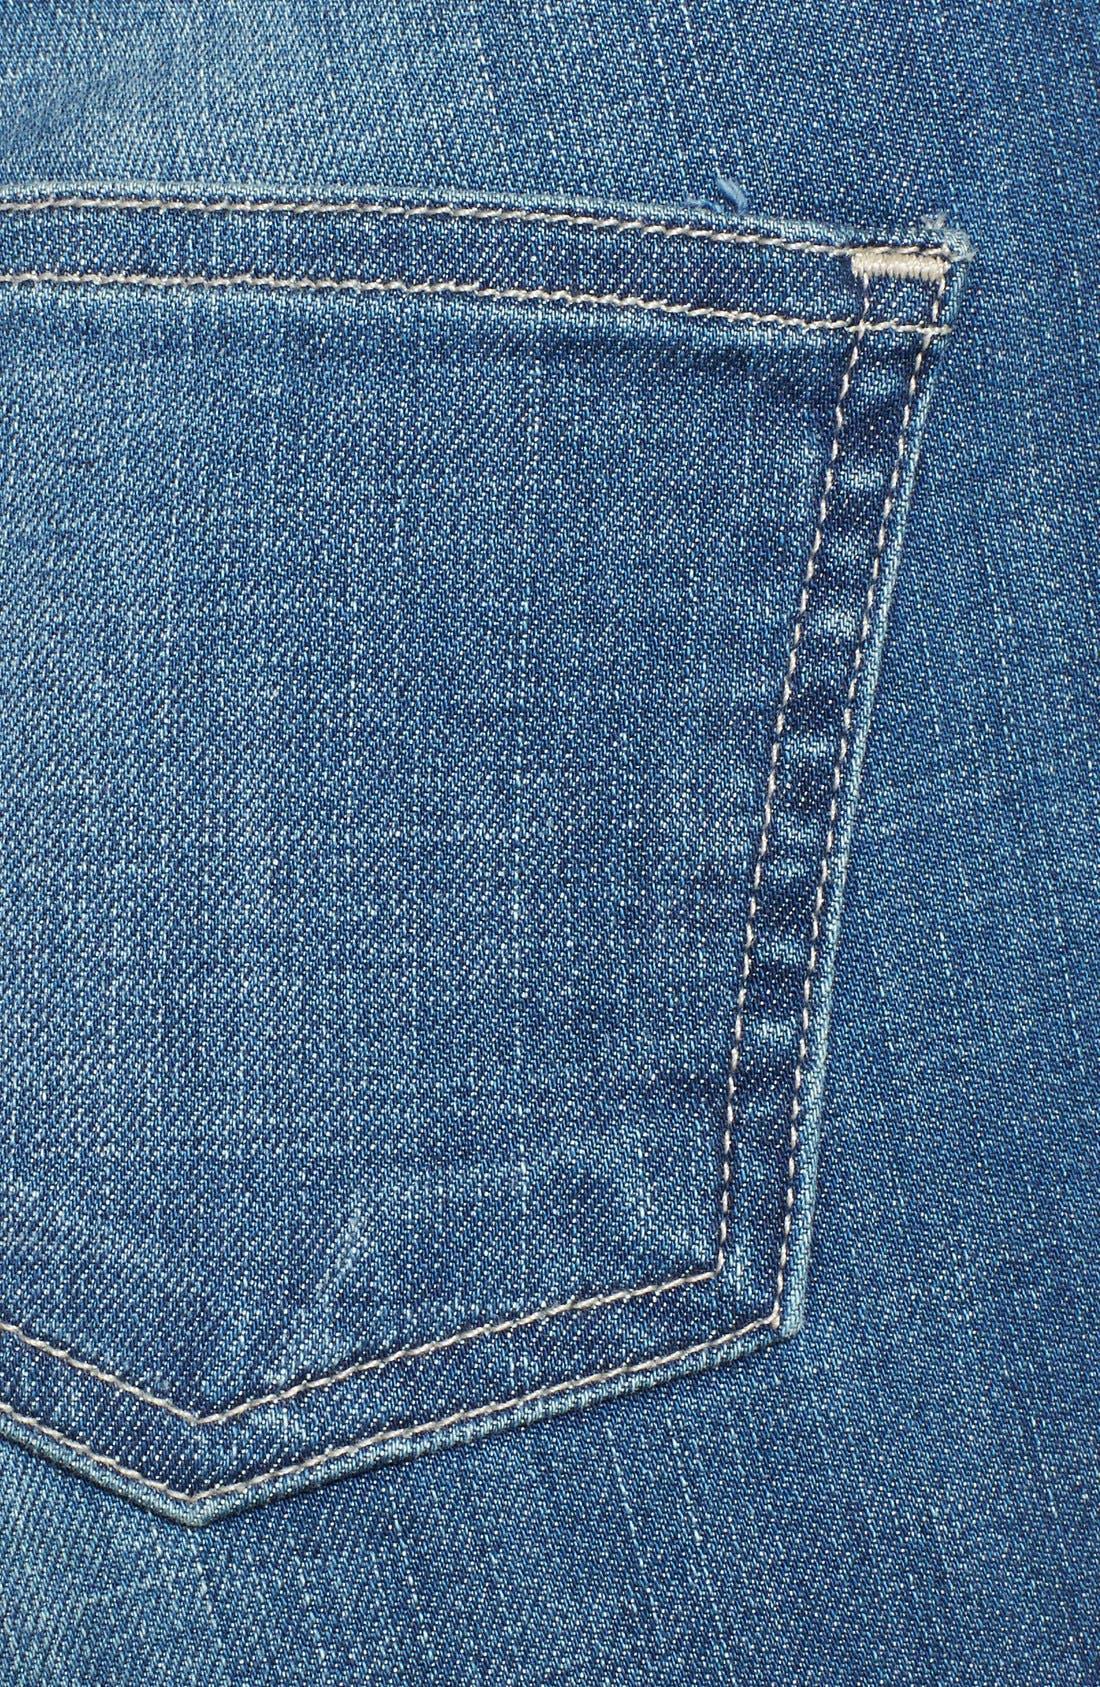 Alternate Image 3  - STS Blue Crochet Detail Distressed High Waist Denim Shorts (Medium Wash) (Juniors)